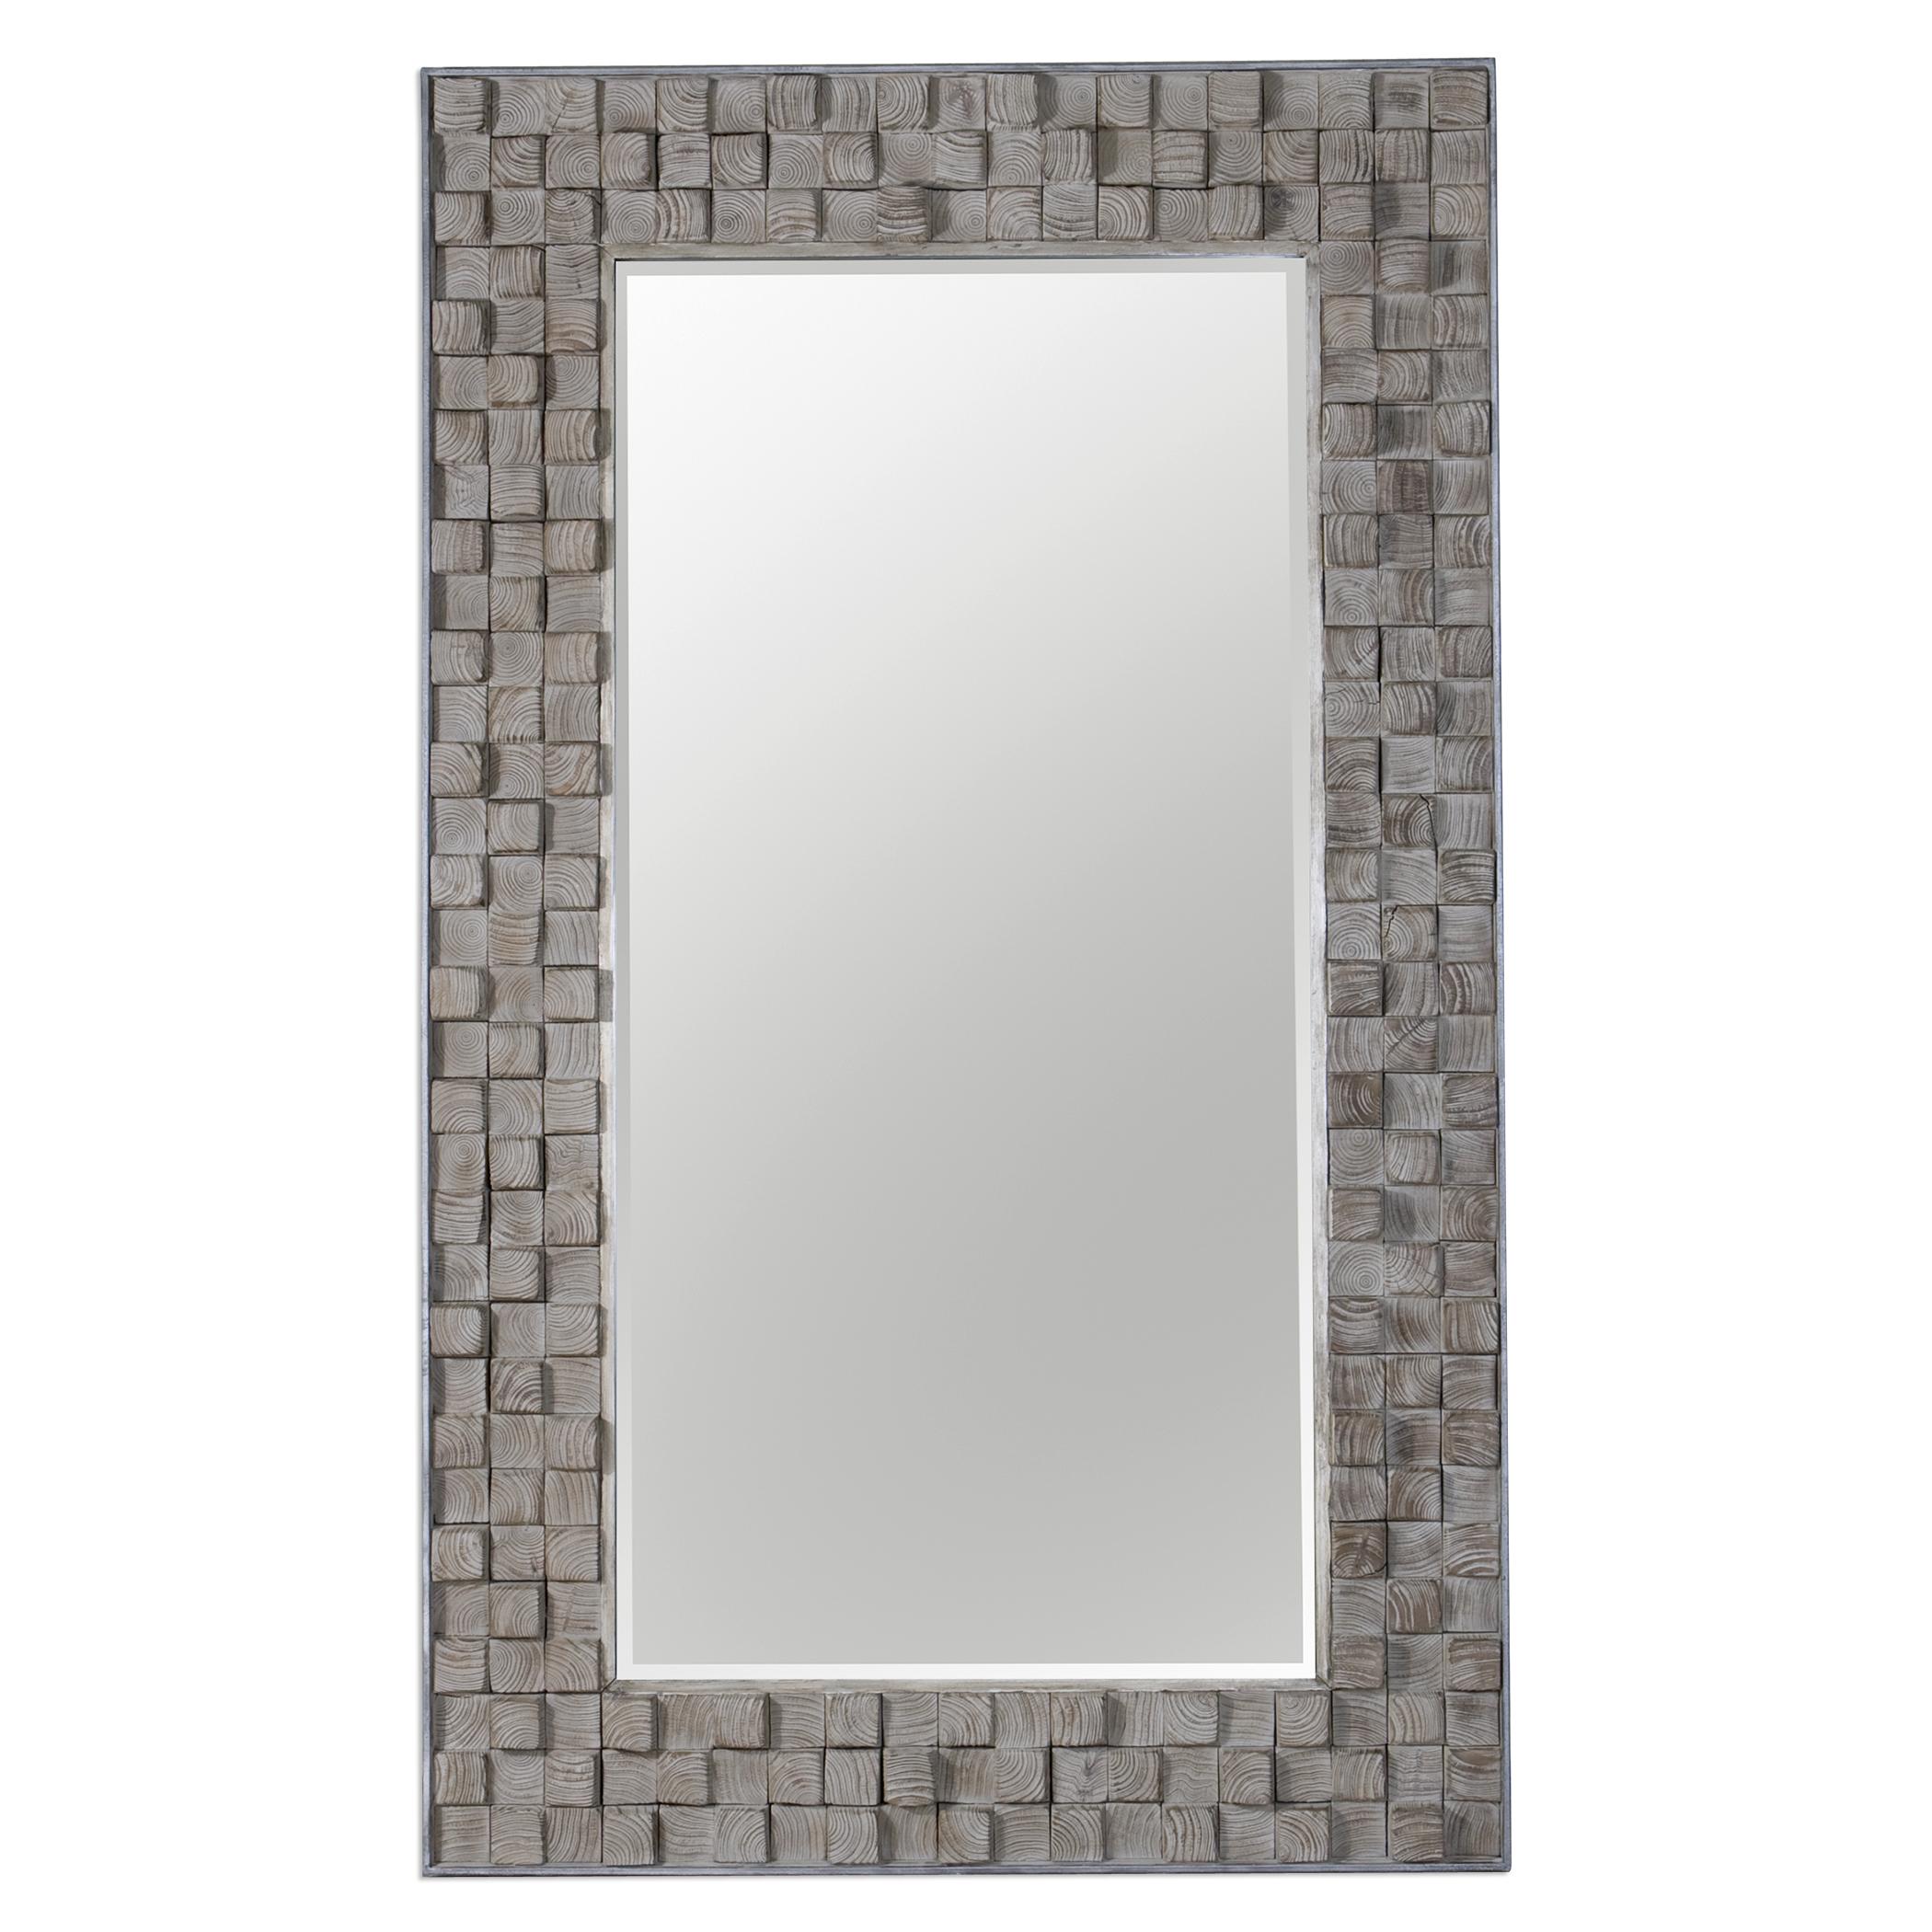 Uttermost Mirrors Beasley Wood Block Mirror - Item Number: 09086